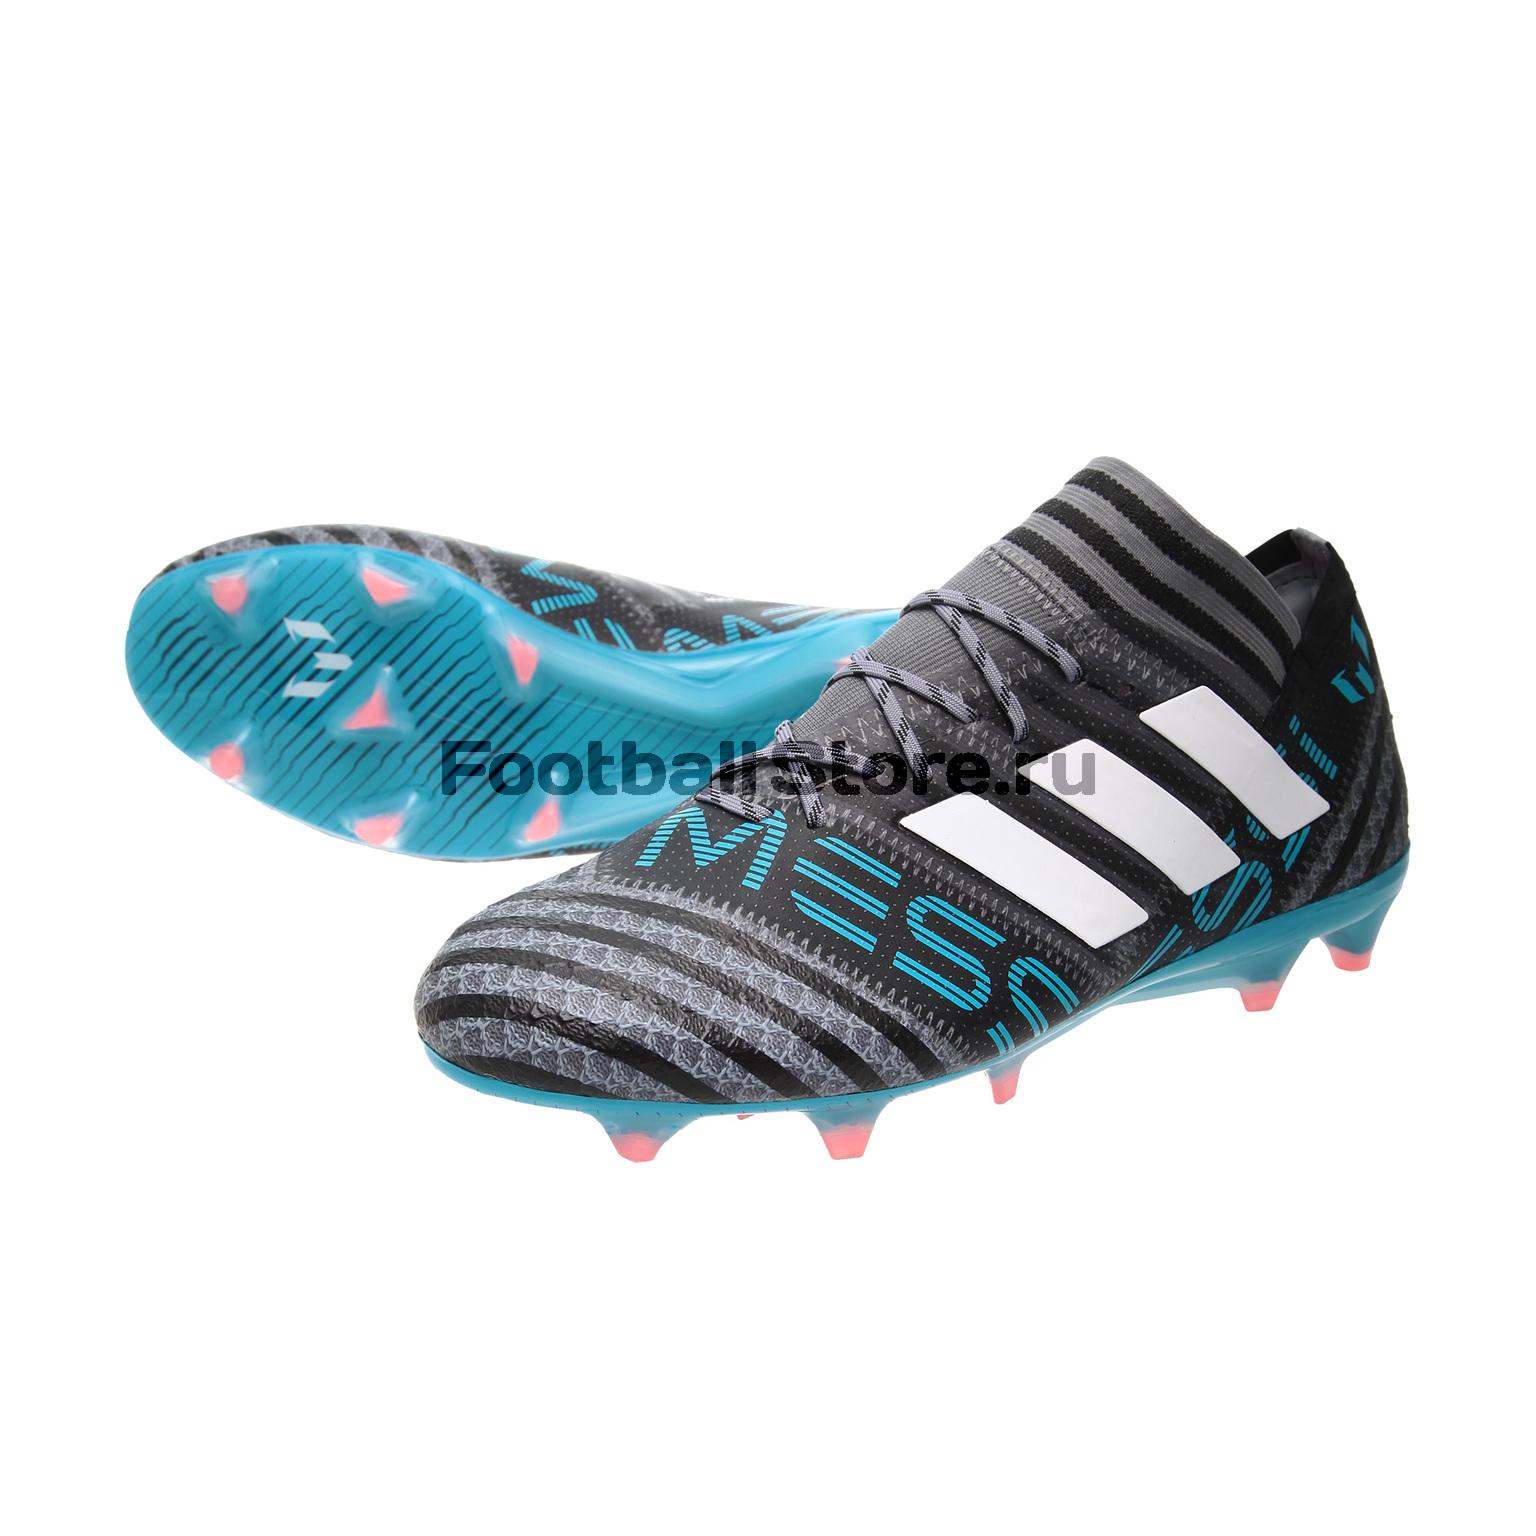 Бутсы Adidas Nemeziz Messi 17.1 FG CP9028 бутсы adidas messi 16 1 fg jr bb3852